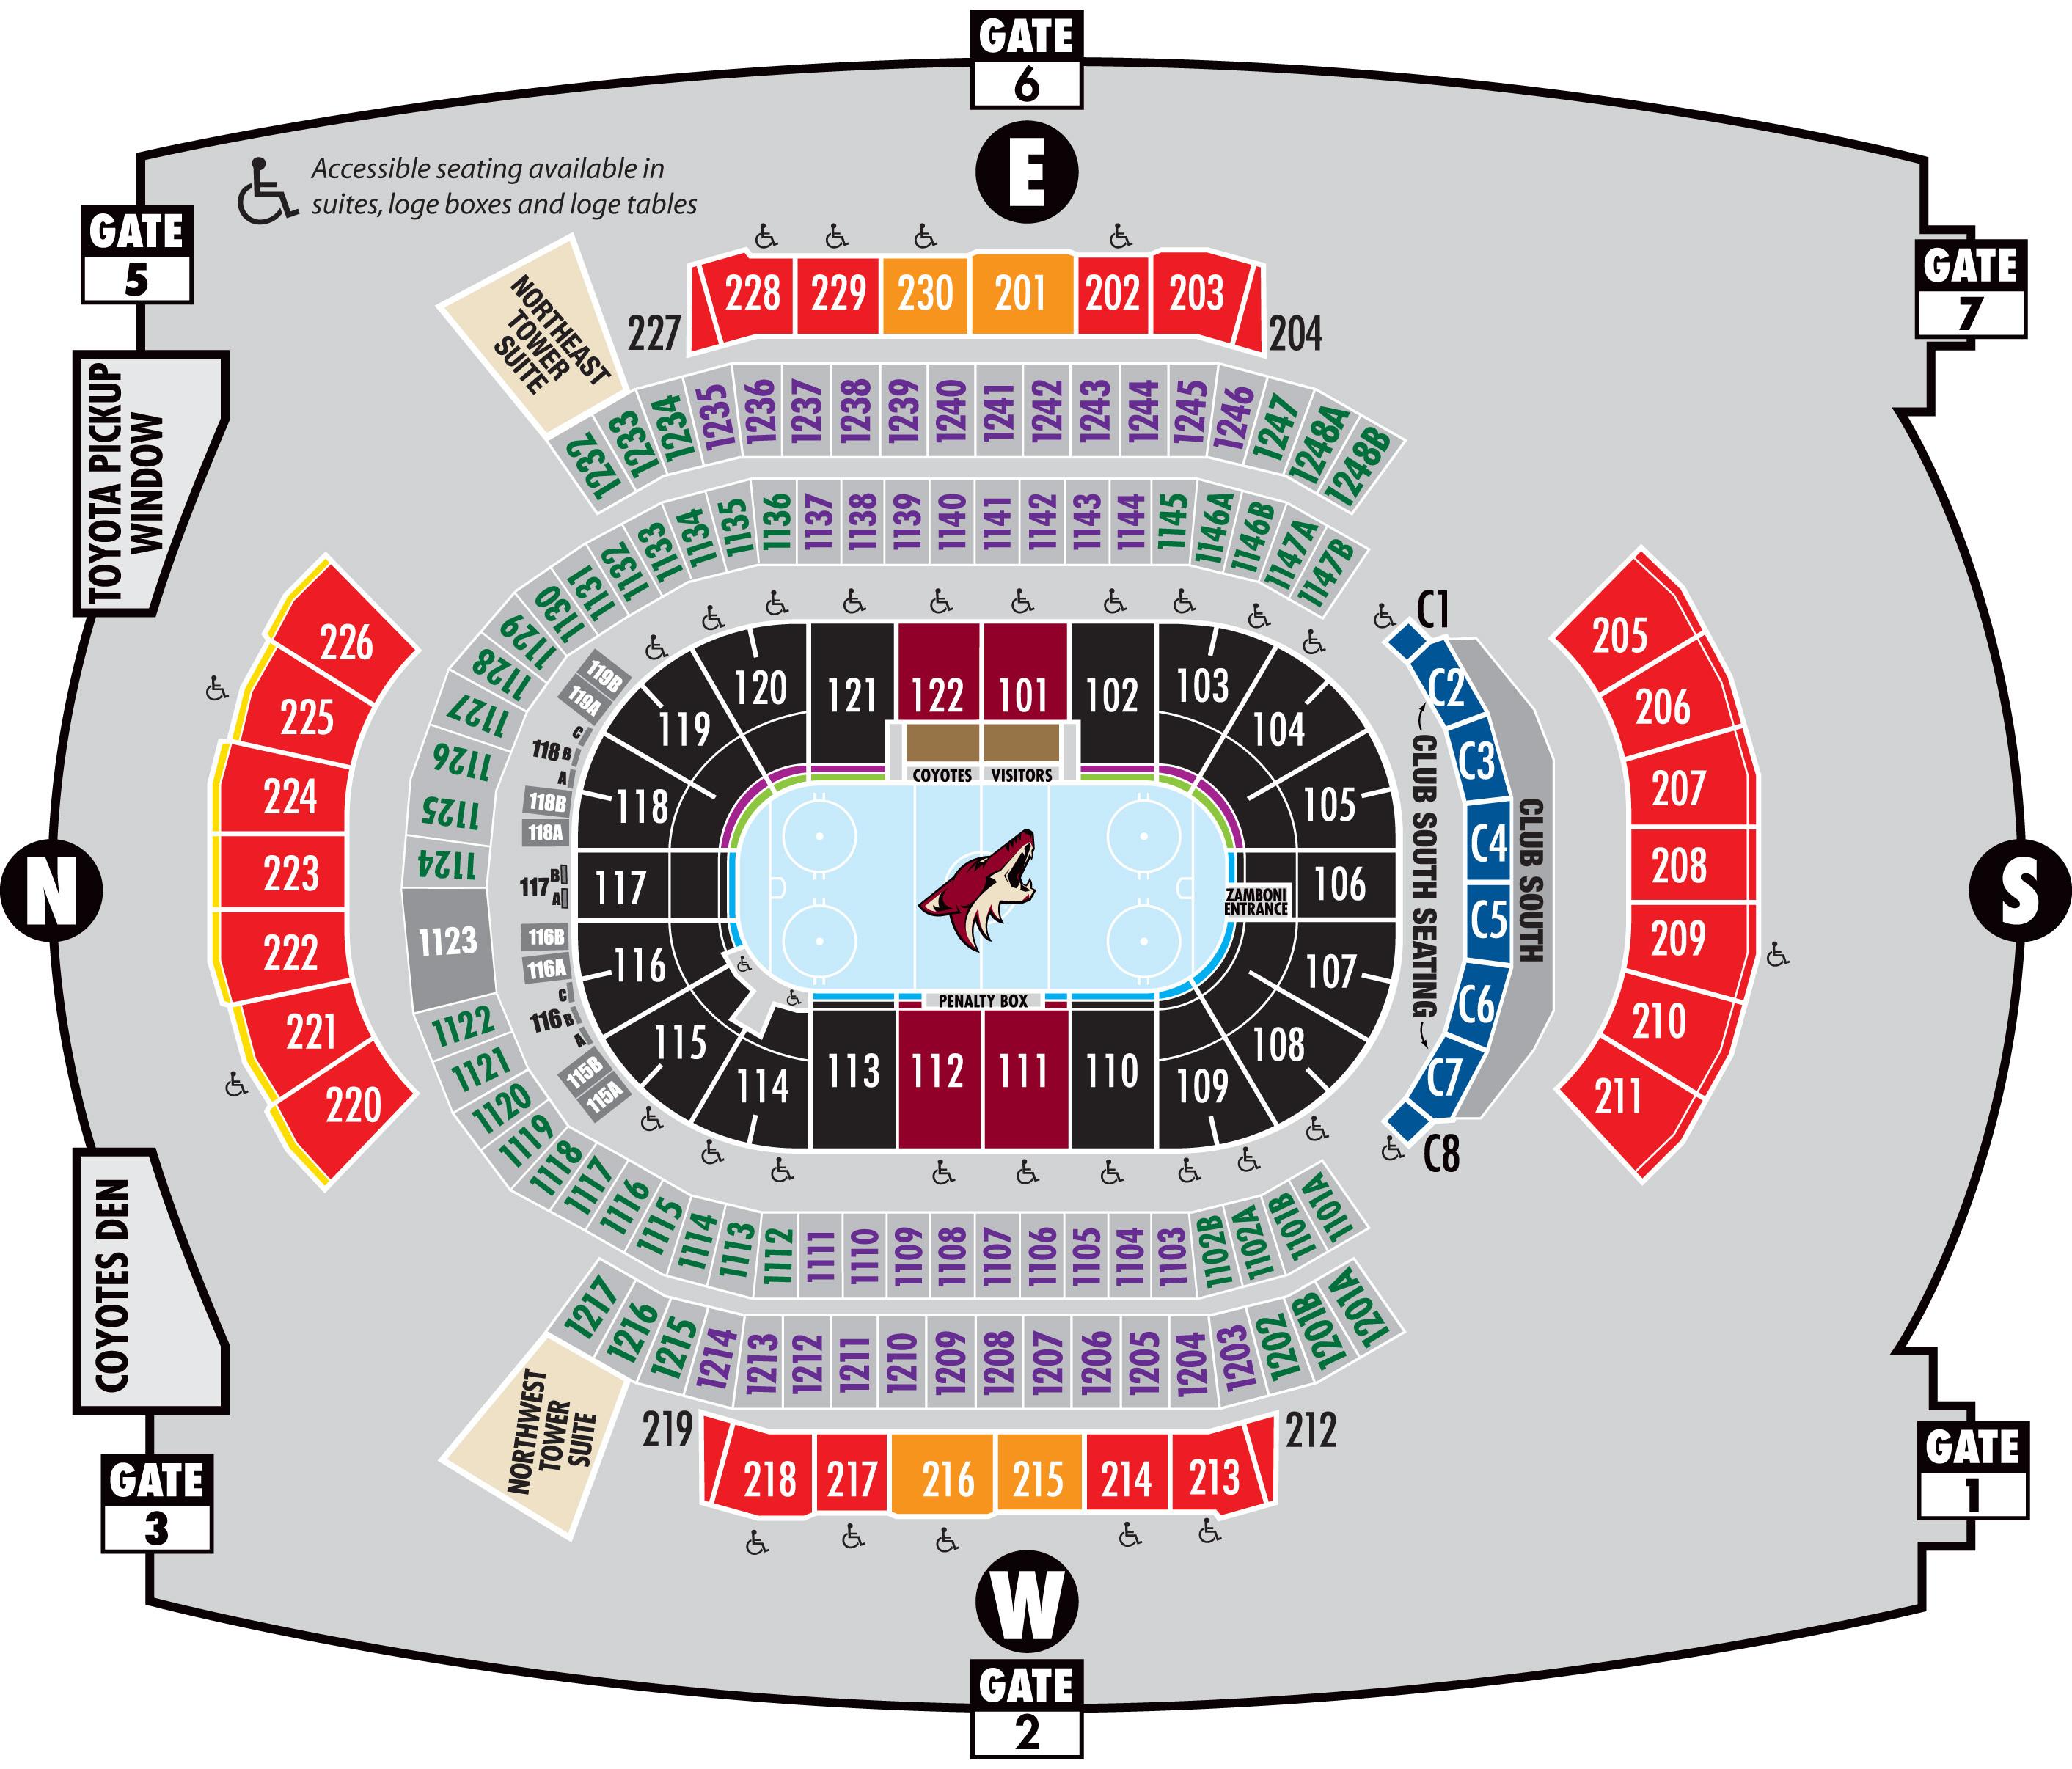 Jobing com arena seating map ancora store